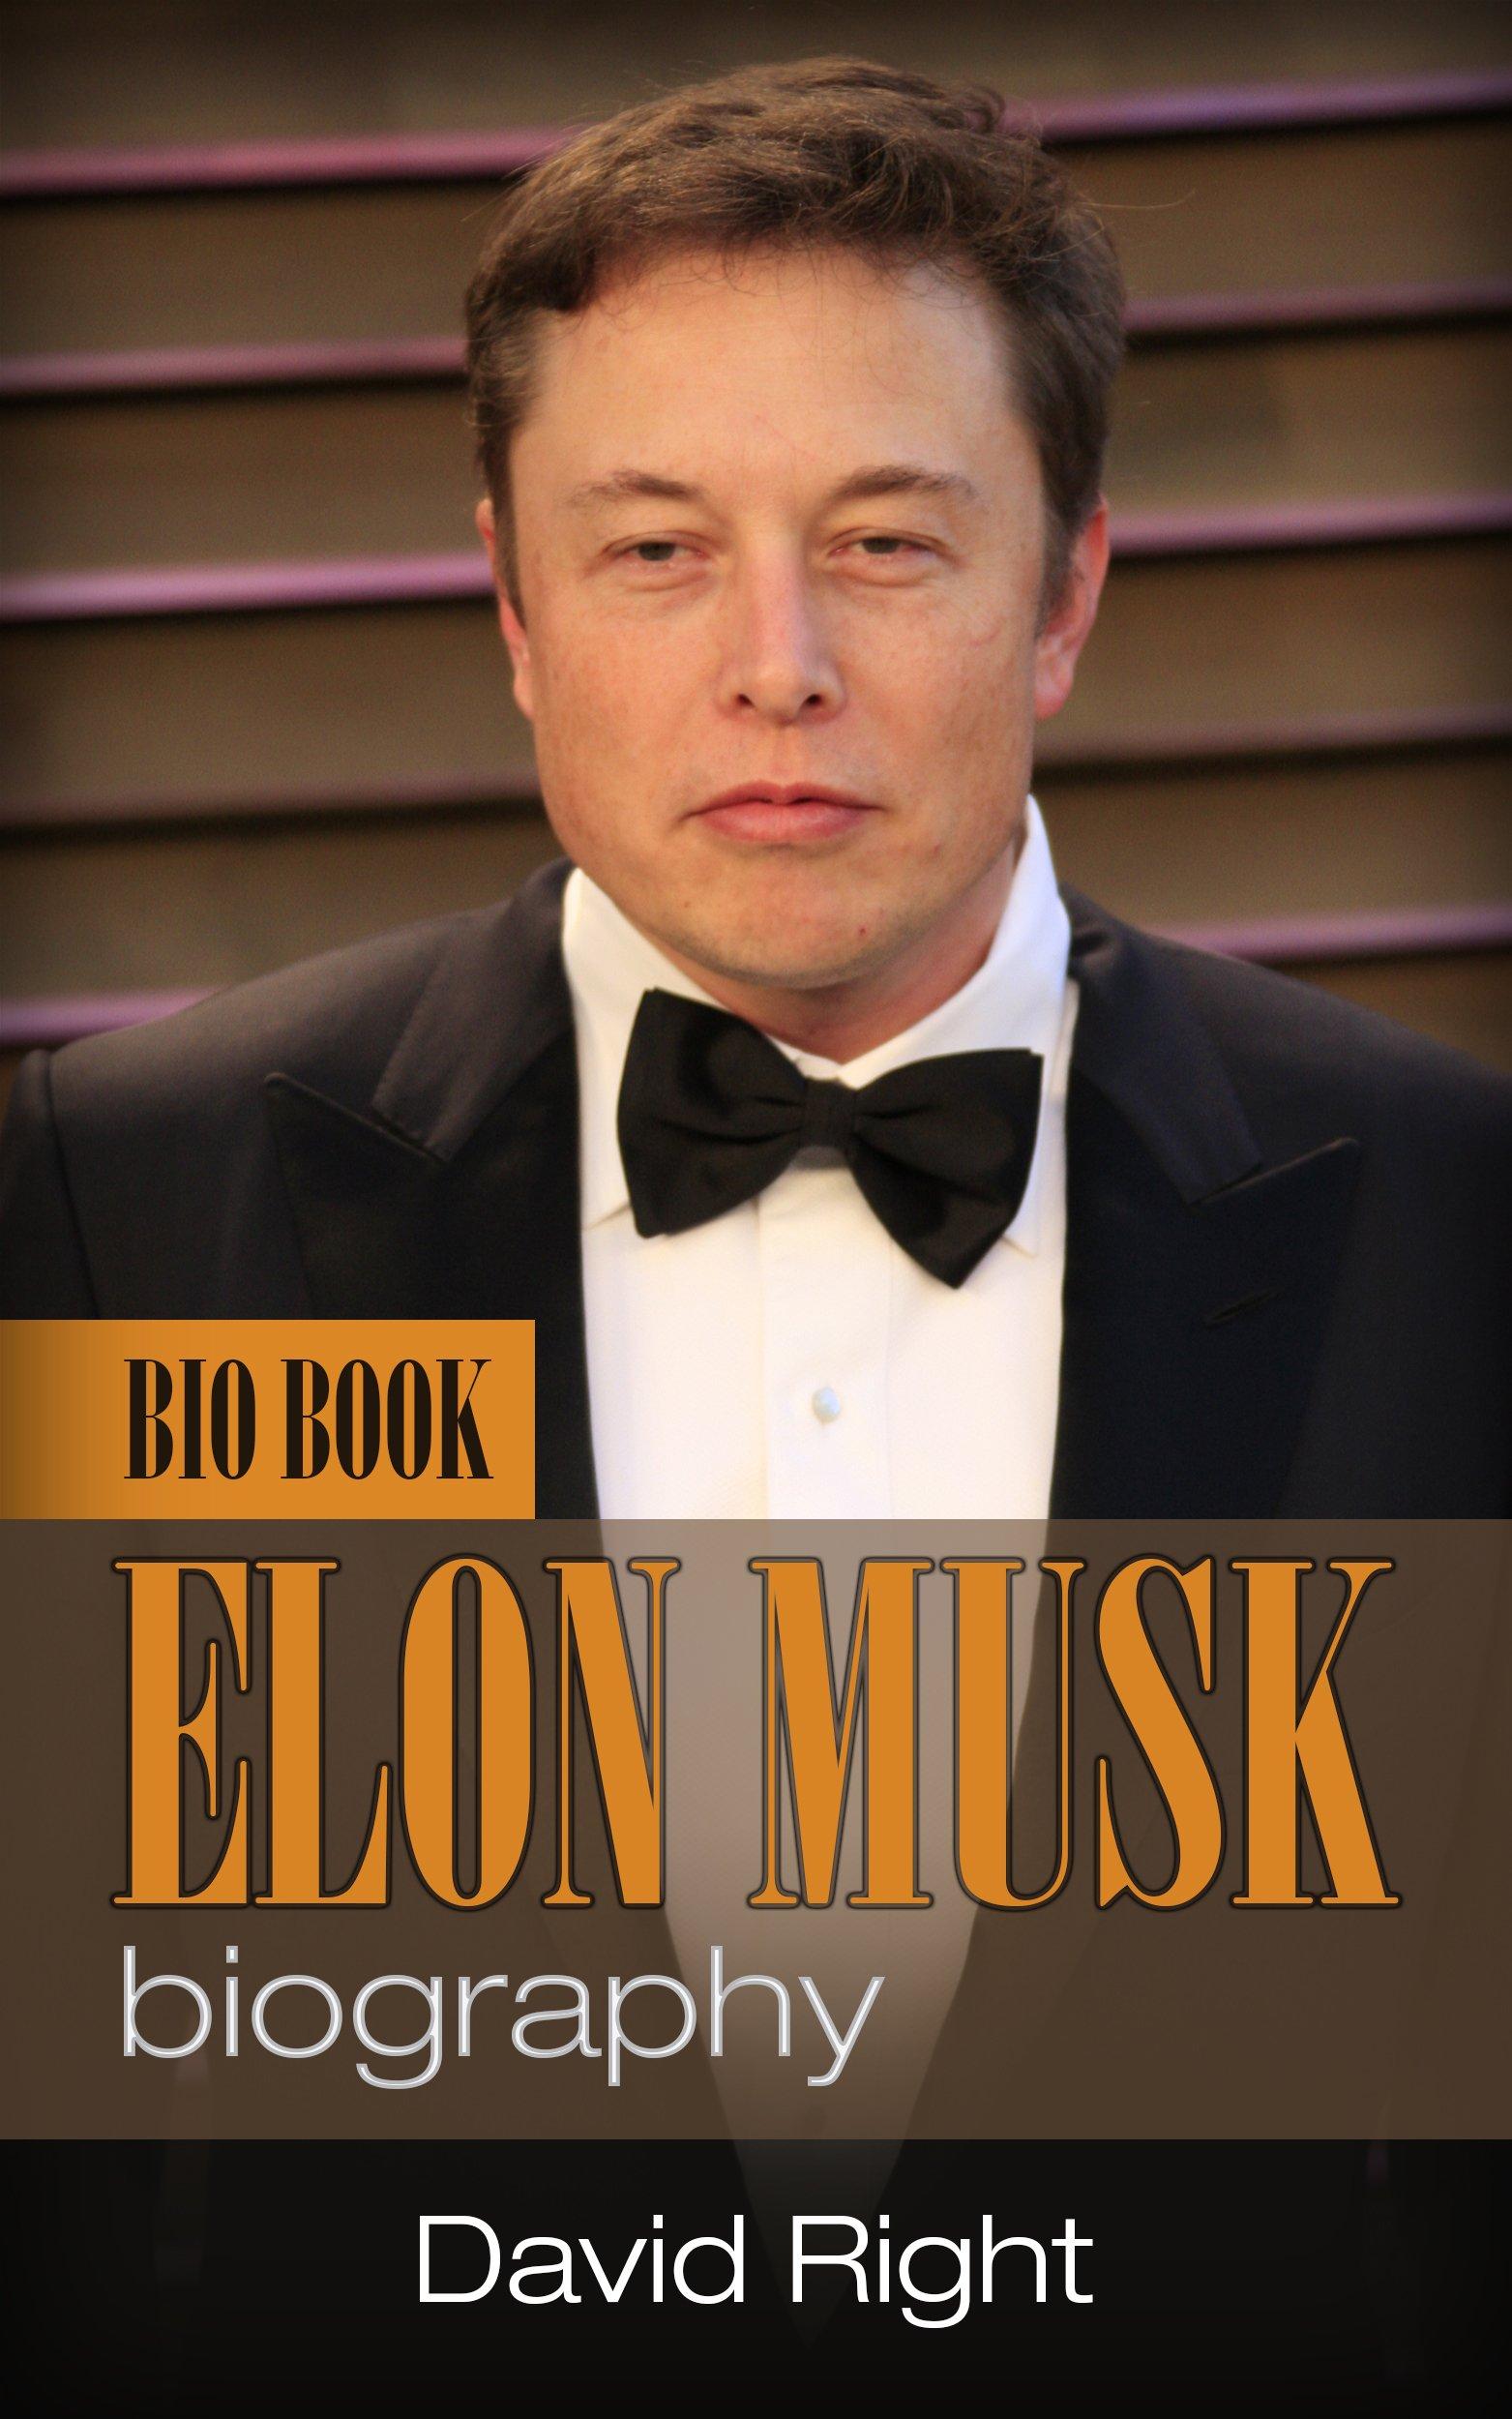 Elon Musk biography bio book